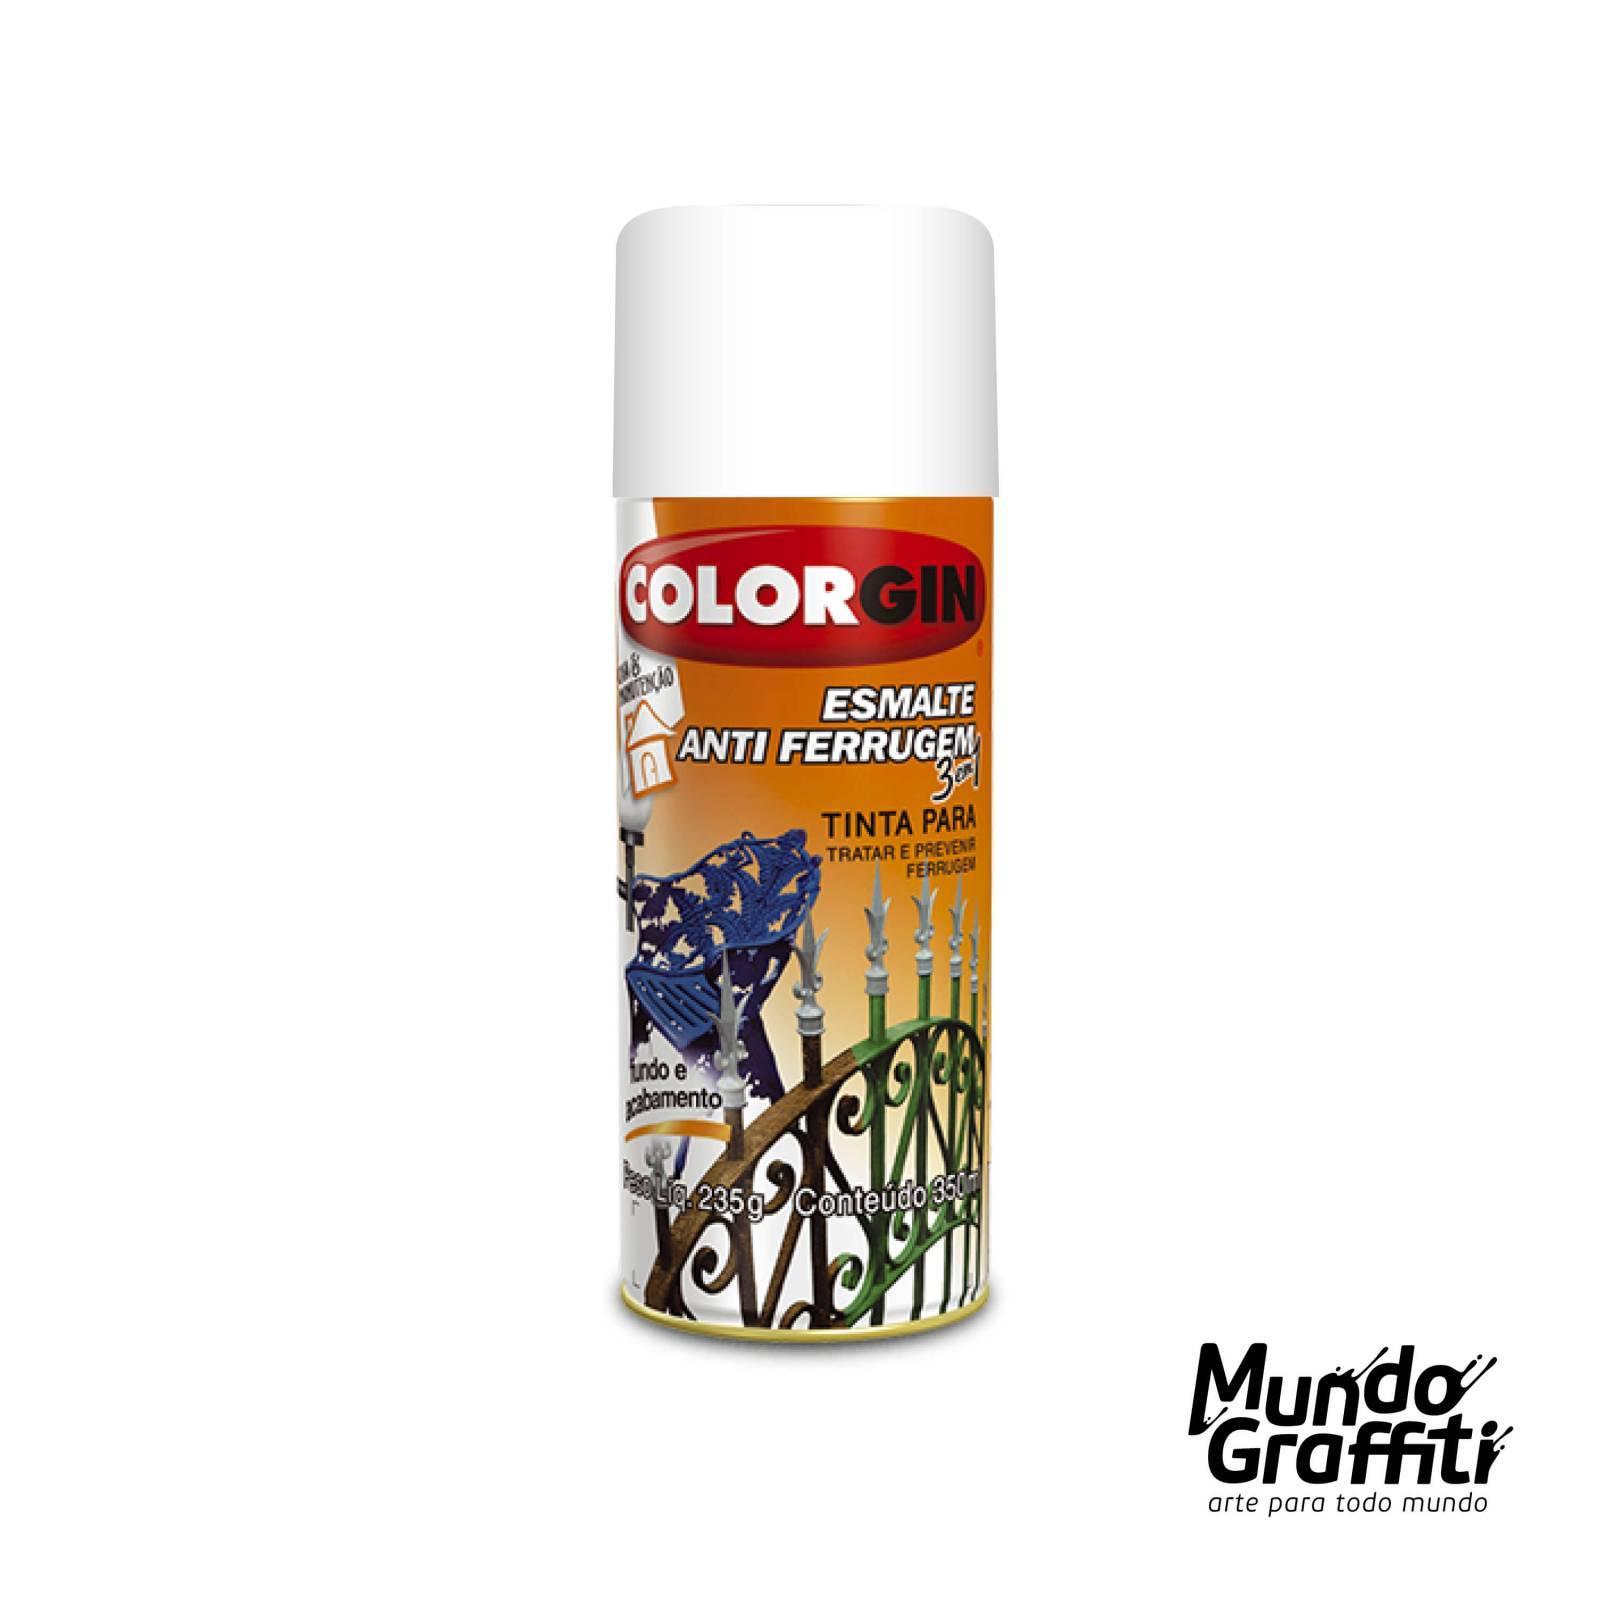 Esmalte Anti Ferrugem 2031 Branco 350ml Colorgin - Mundo Graffiti